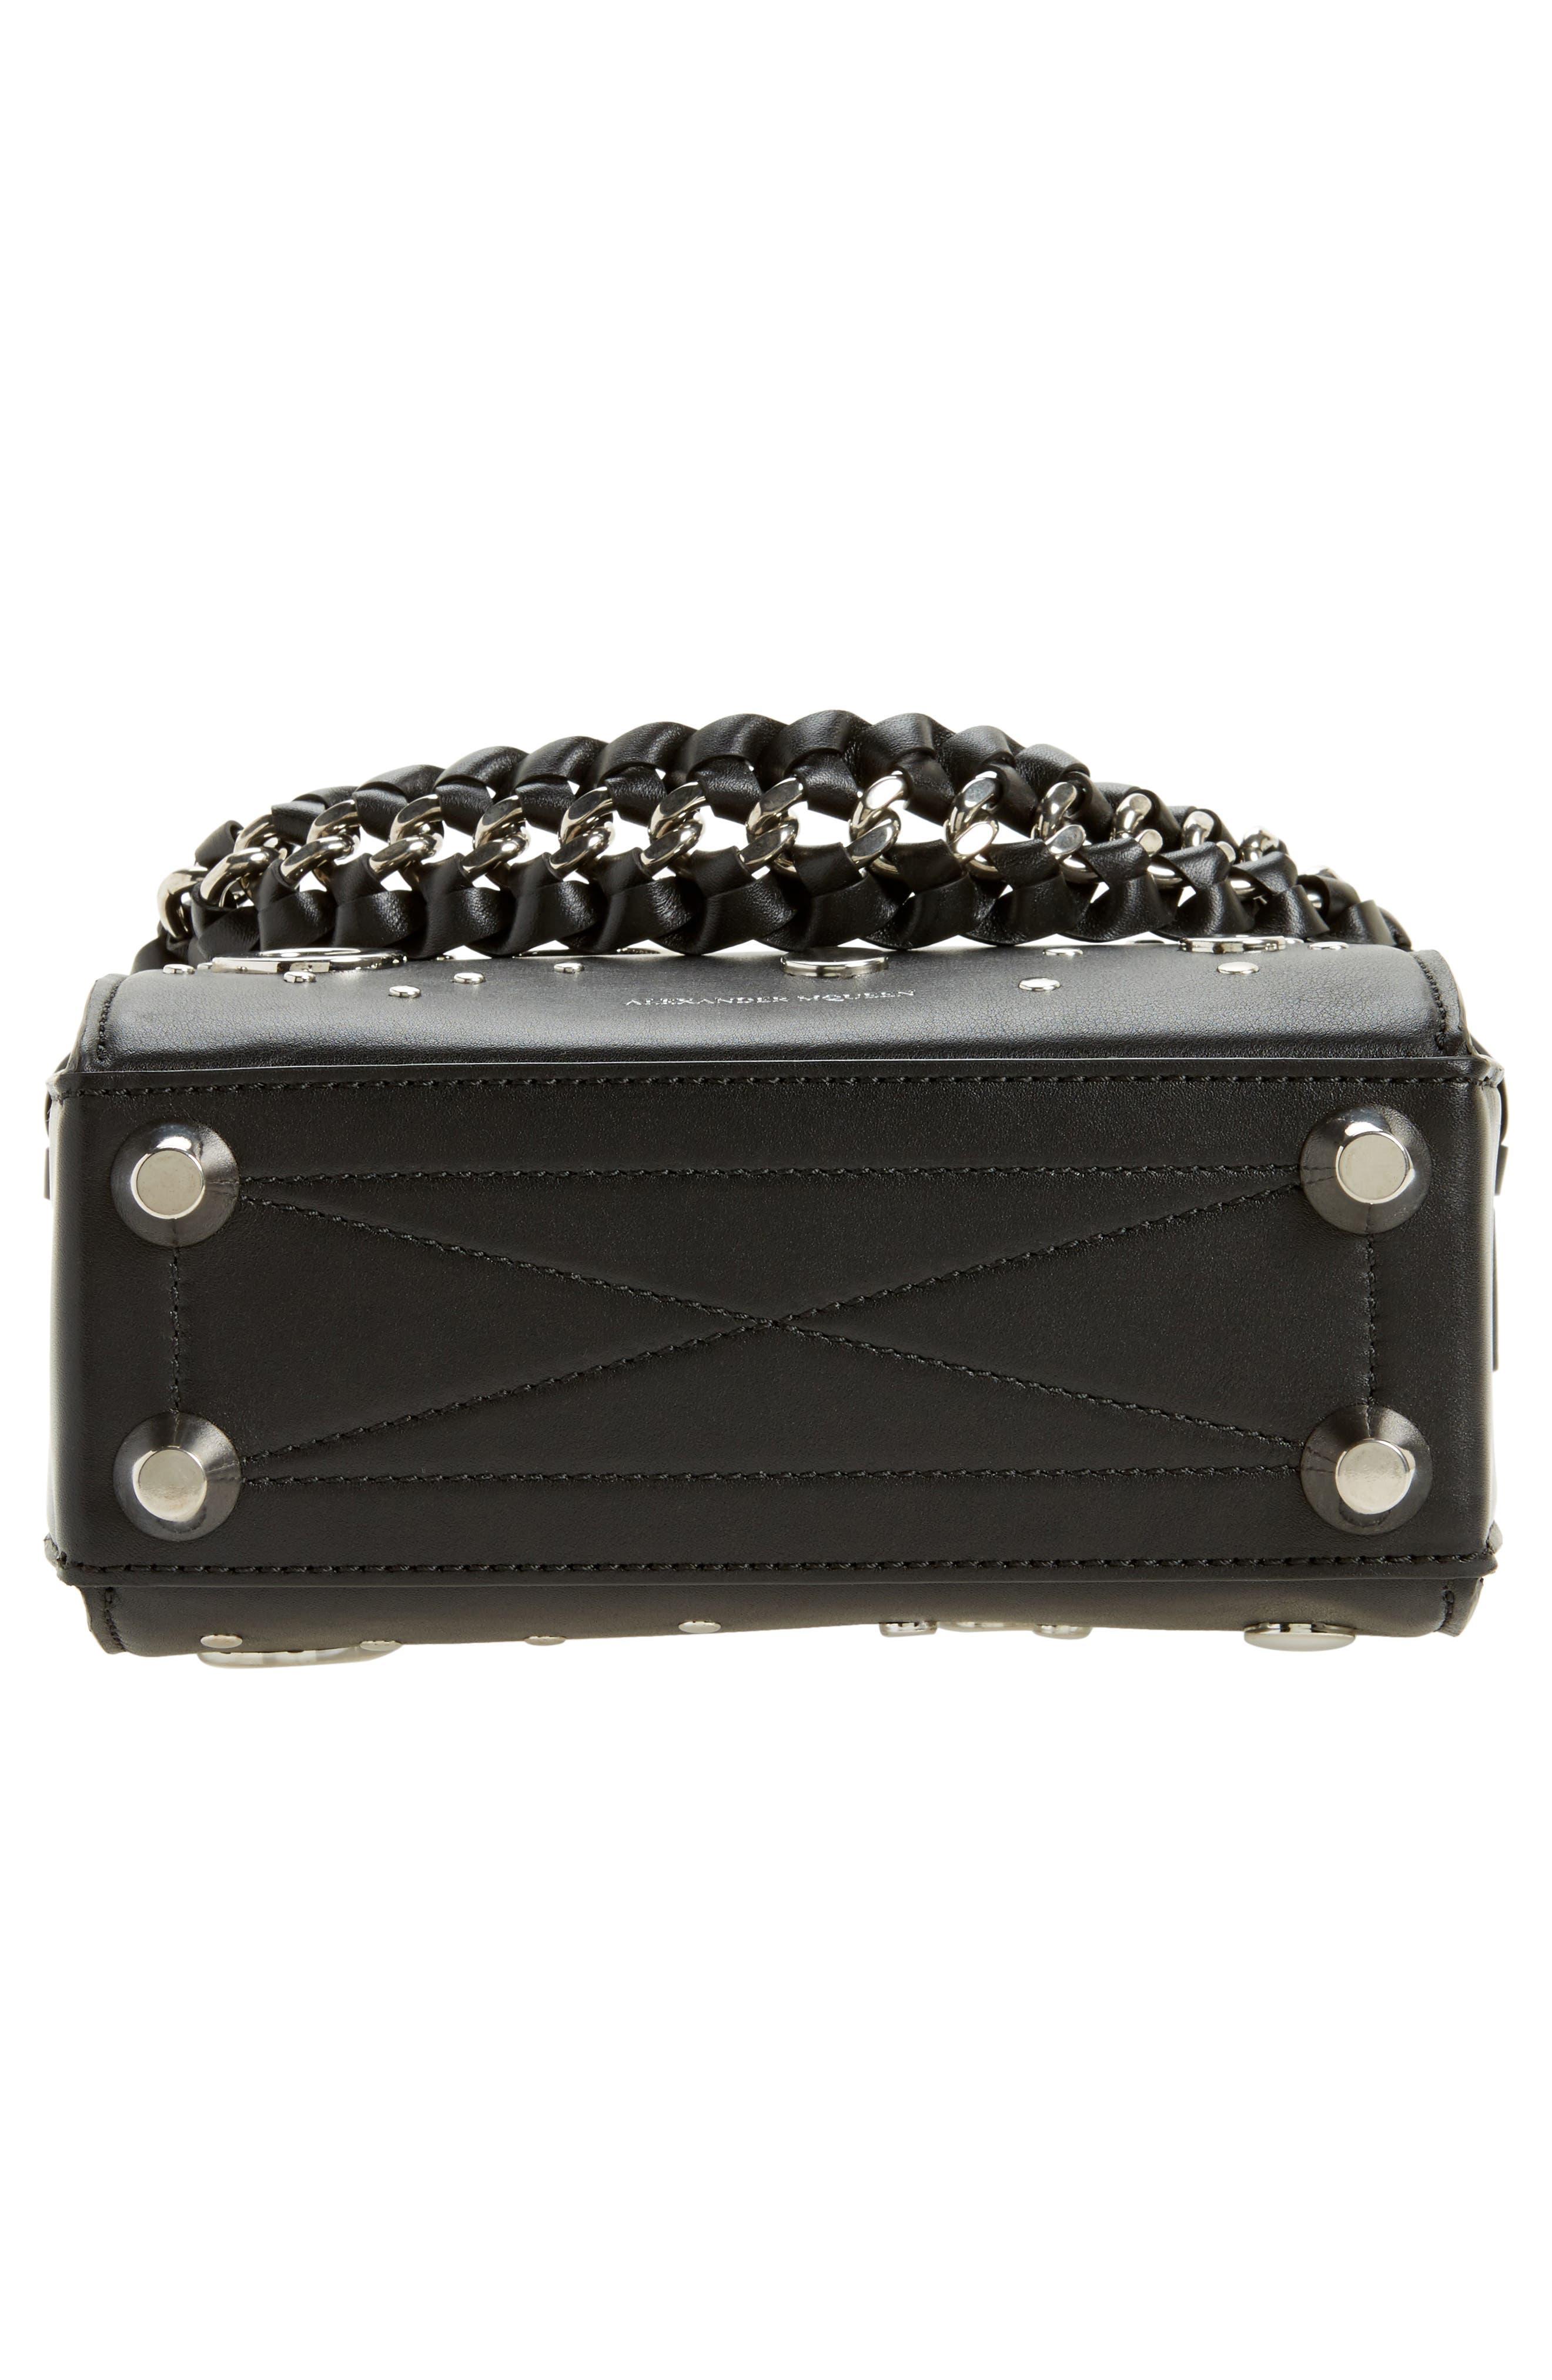 Grommet & Stud Calfskin Leather Box Bag,                             Alternate thumbnail 6, color,                             001